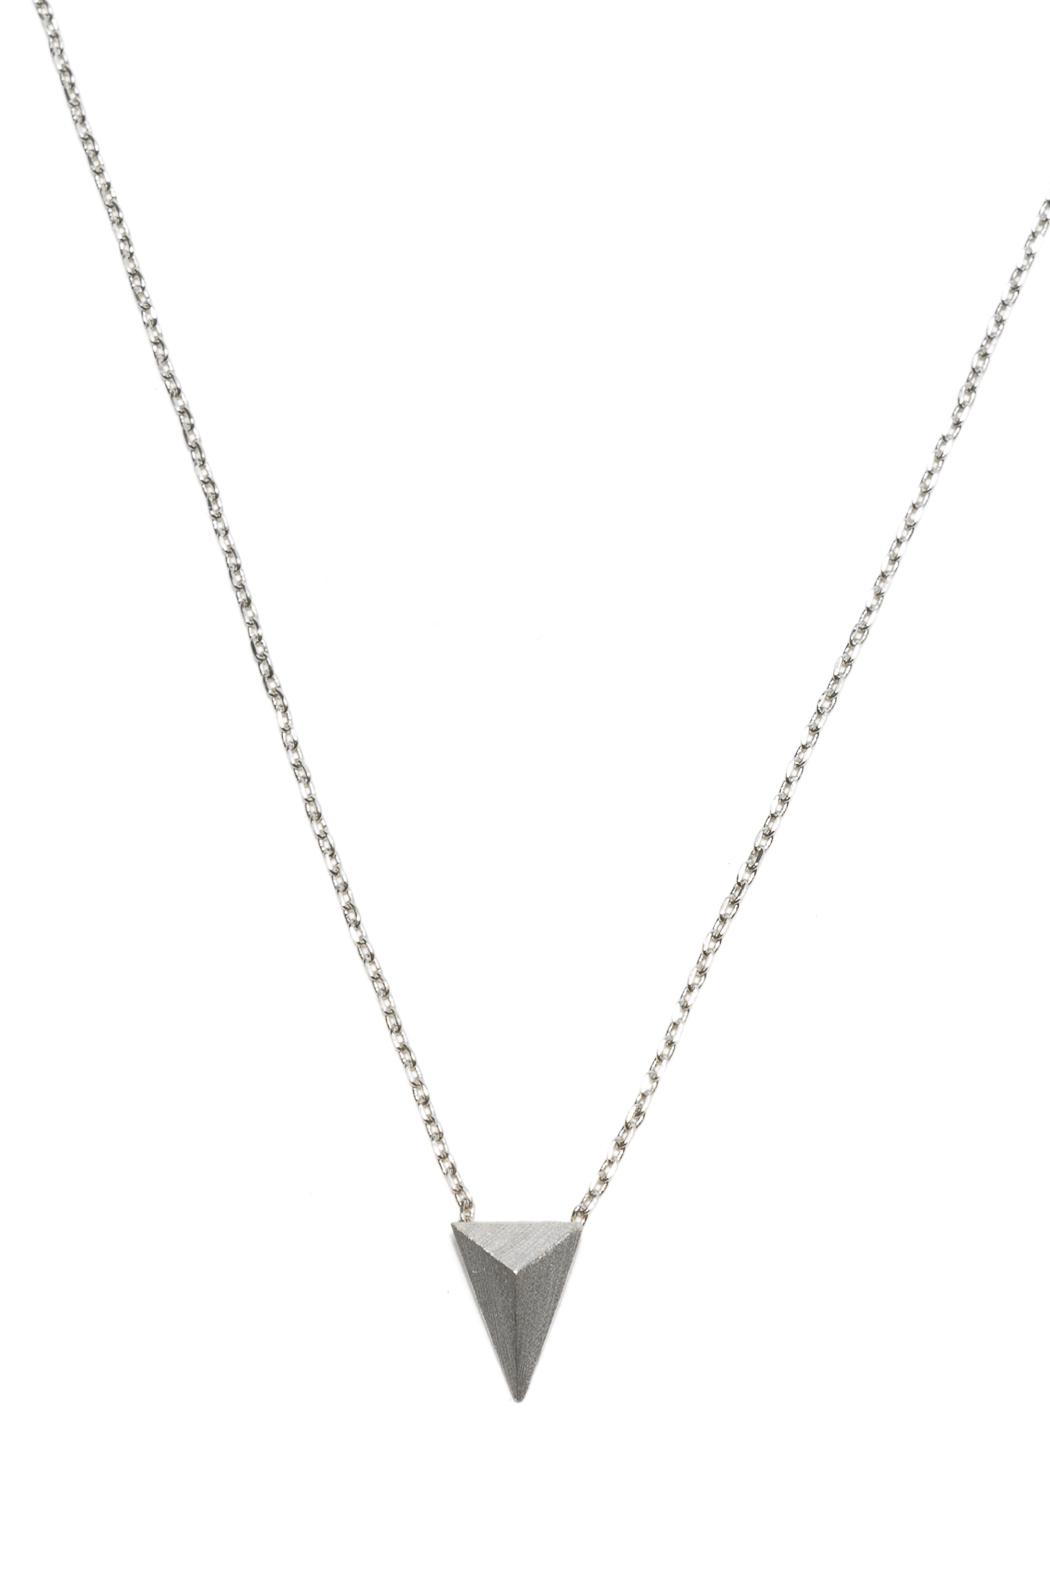 raised triangular silver.jpg